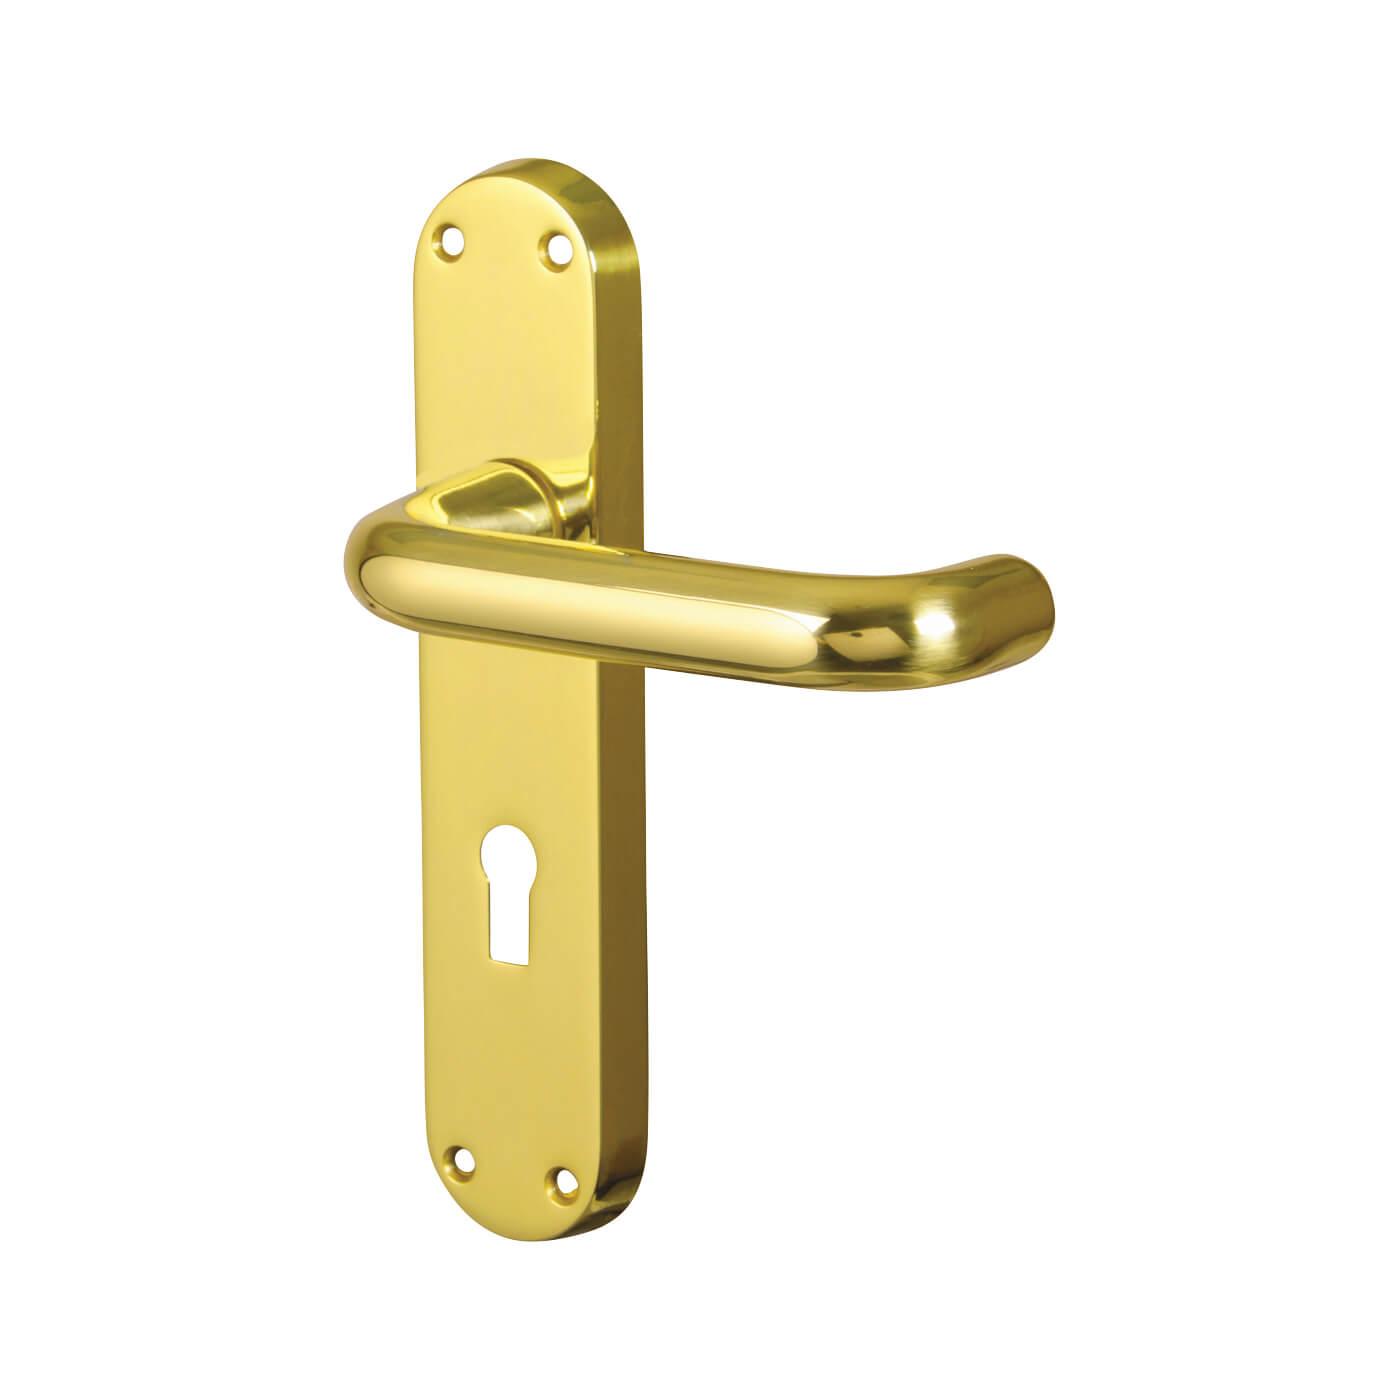 Carlisle Brass 19mm Return To Door Handle Keyhole Lock